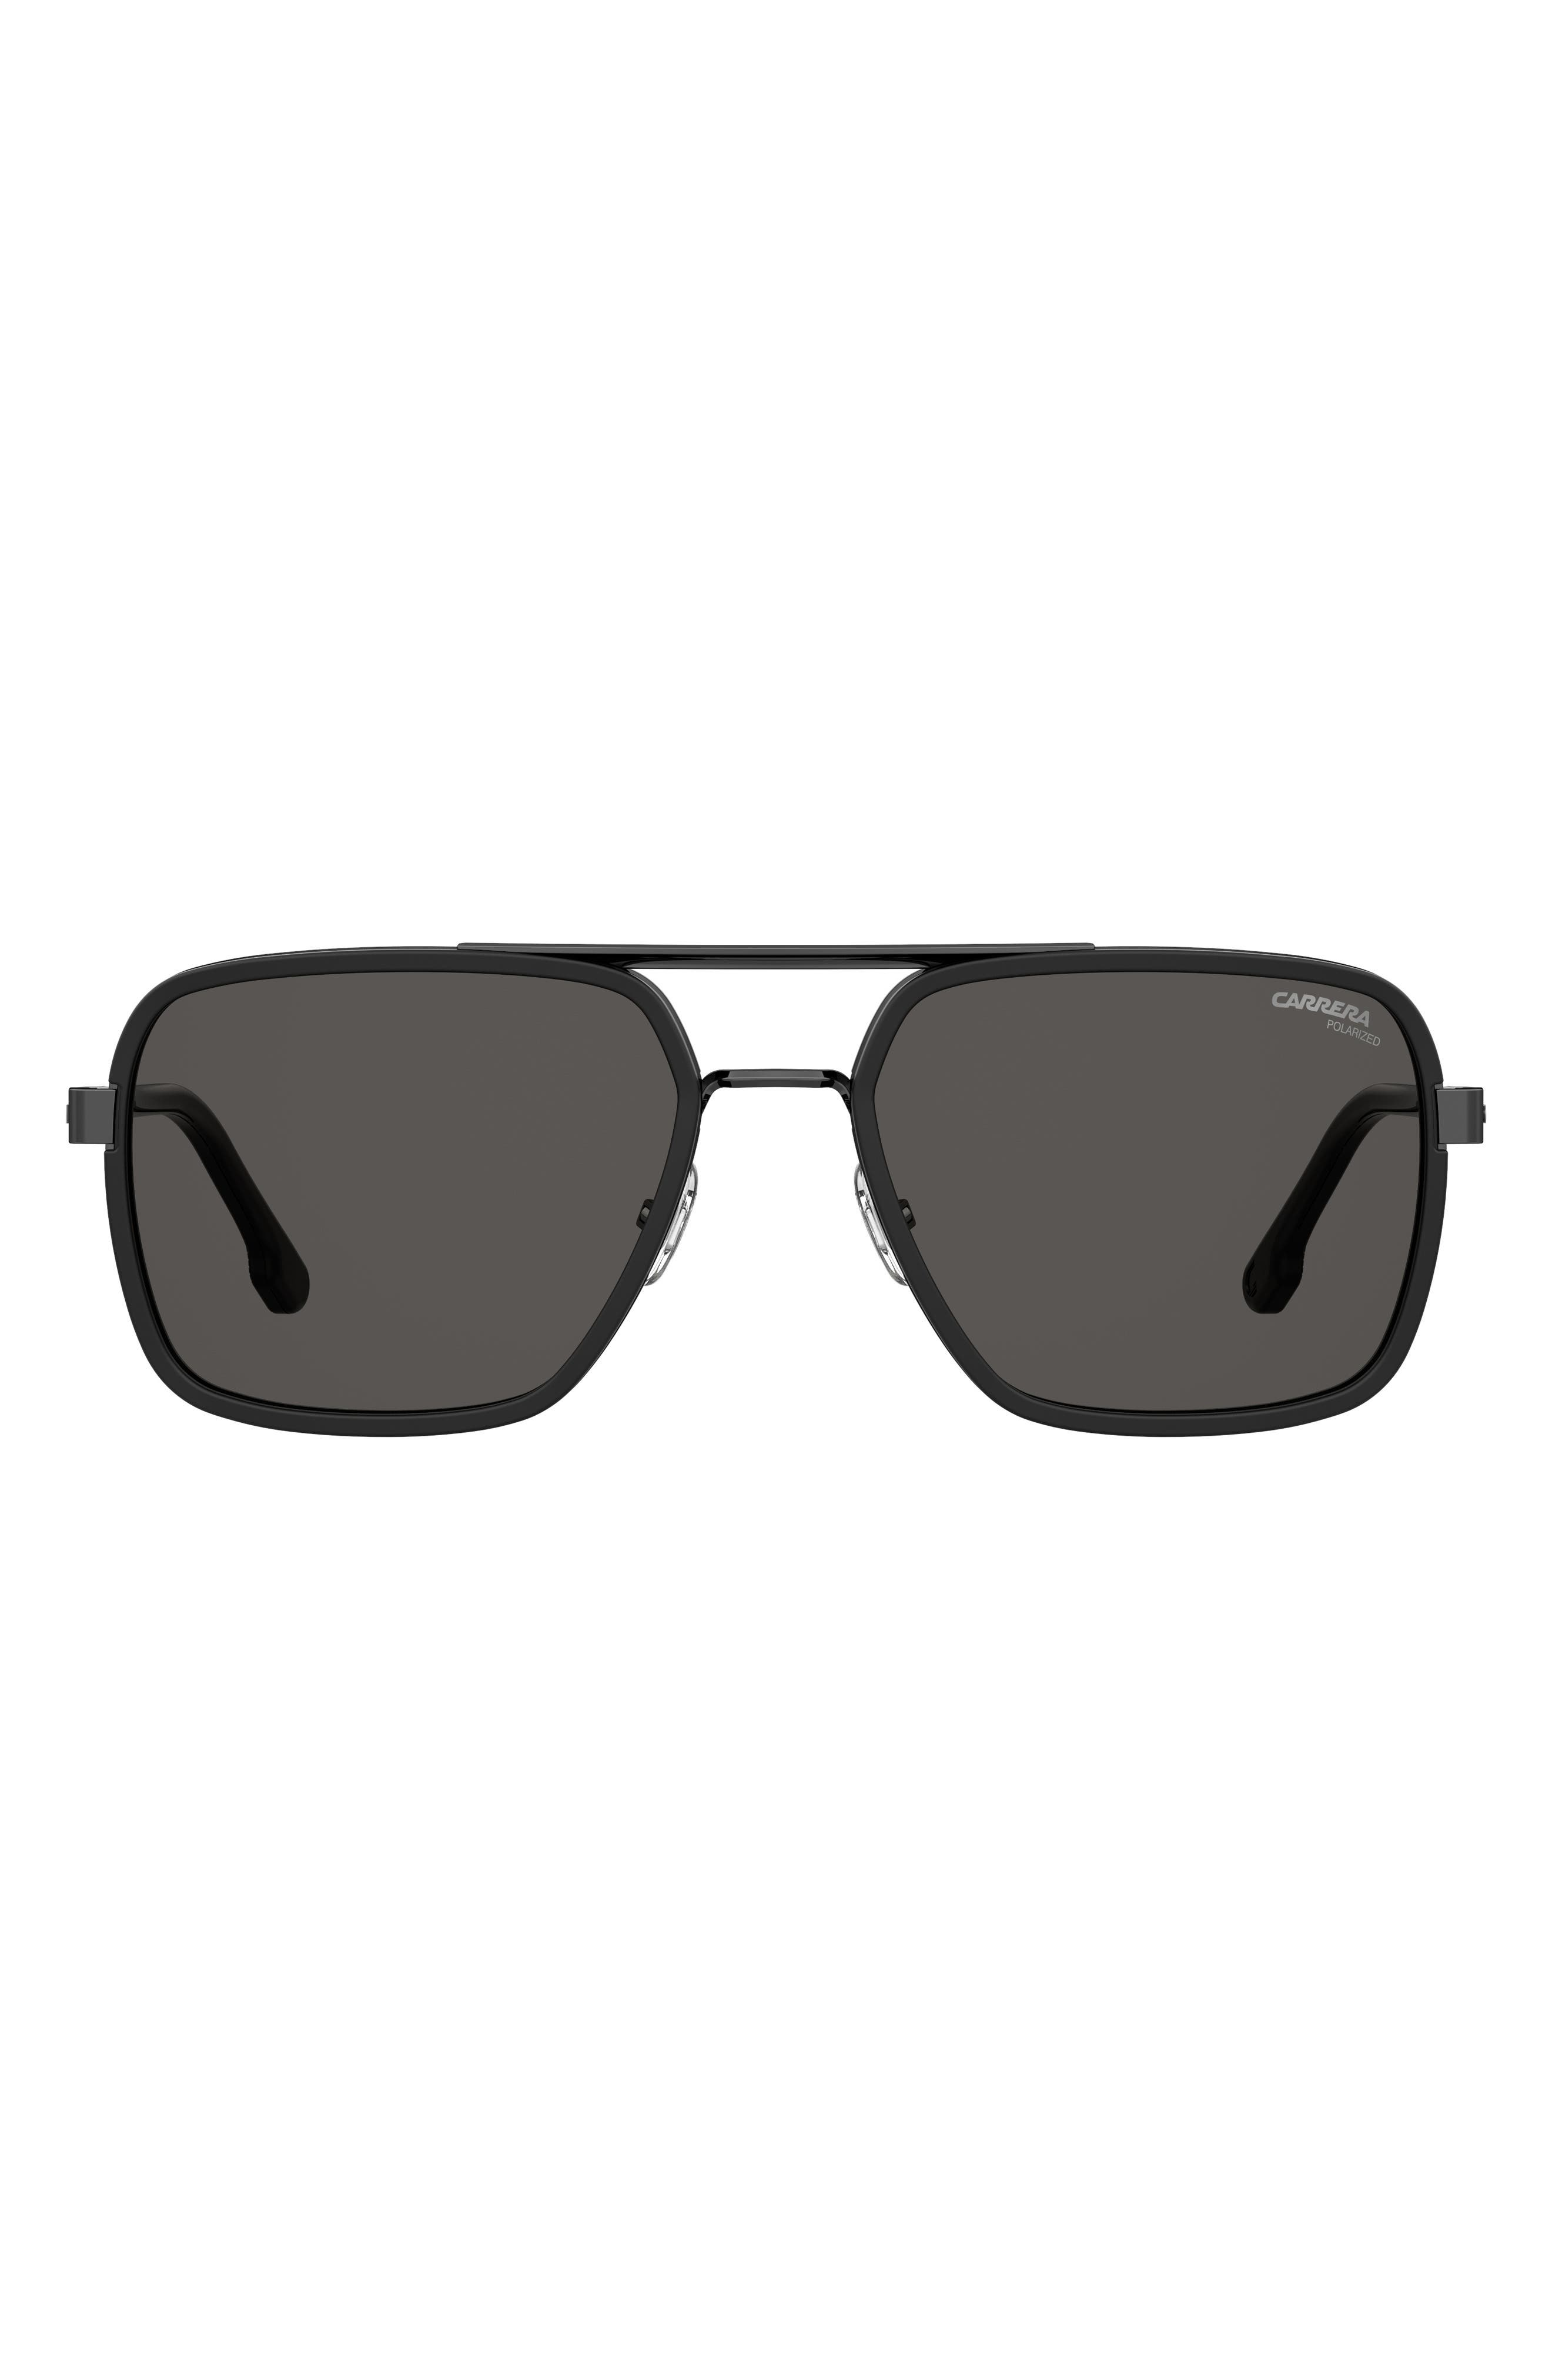 Ca 256 58mm Navigator Sunglasses